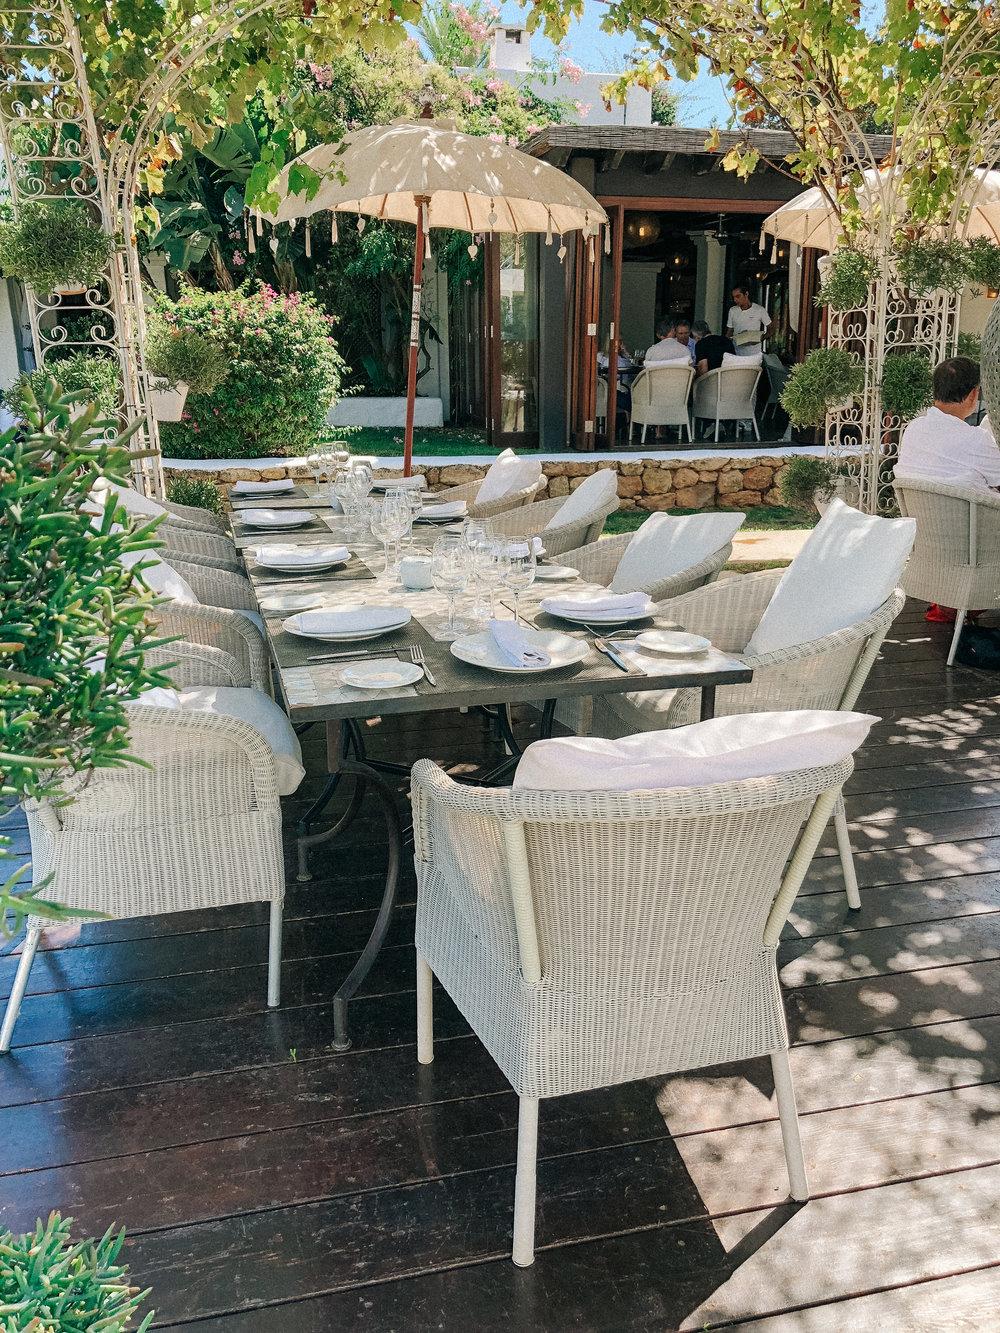 Atzaro Ibiza Guide